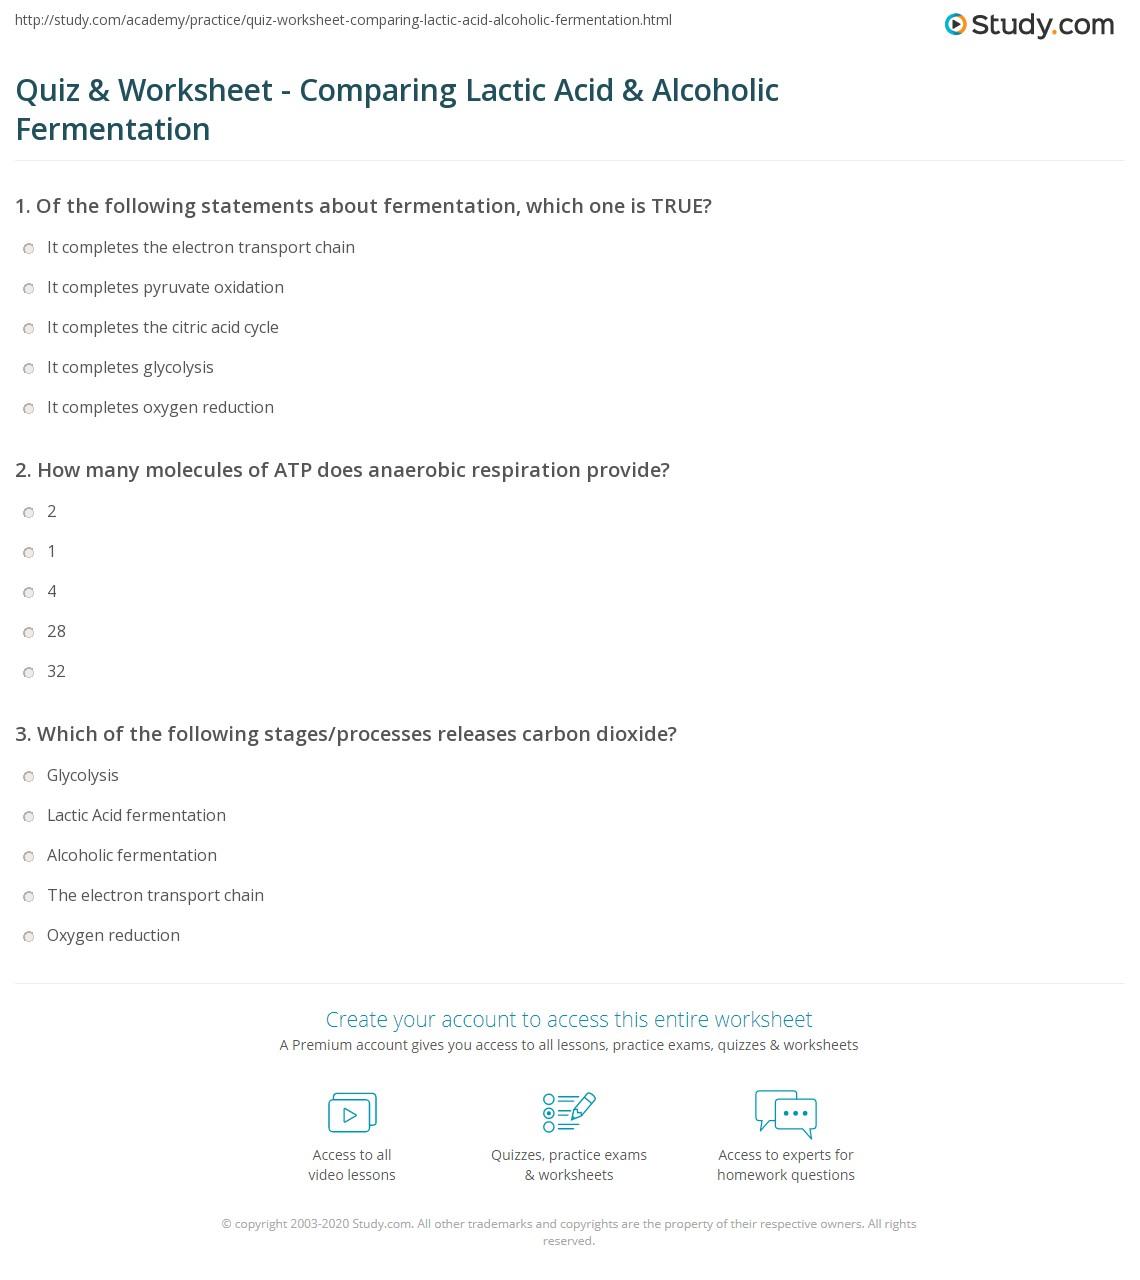 worksheet Fermentation Worksheet quiz worksheet comparing lactic acid alcoholic fermentation print comparison contrast examples worksheet